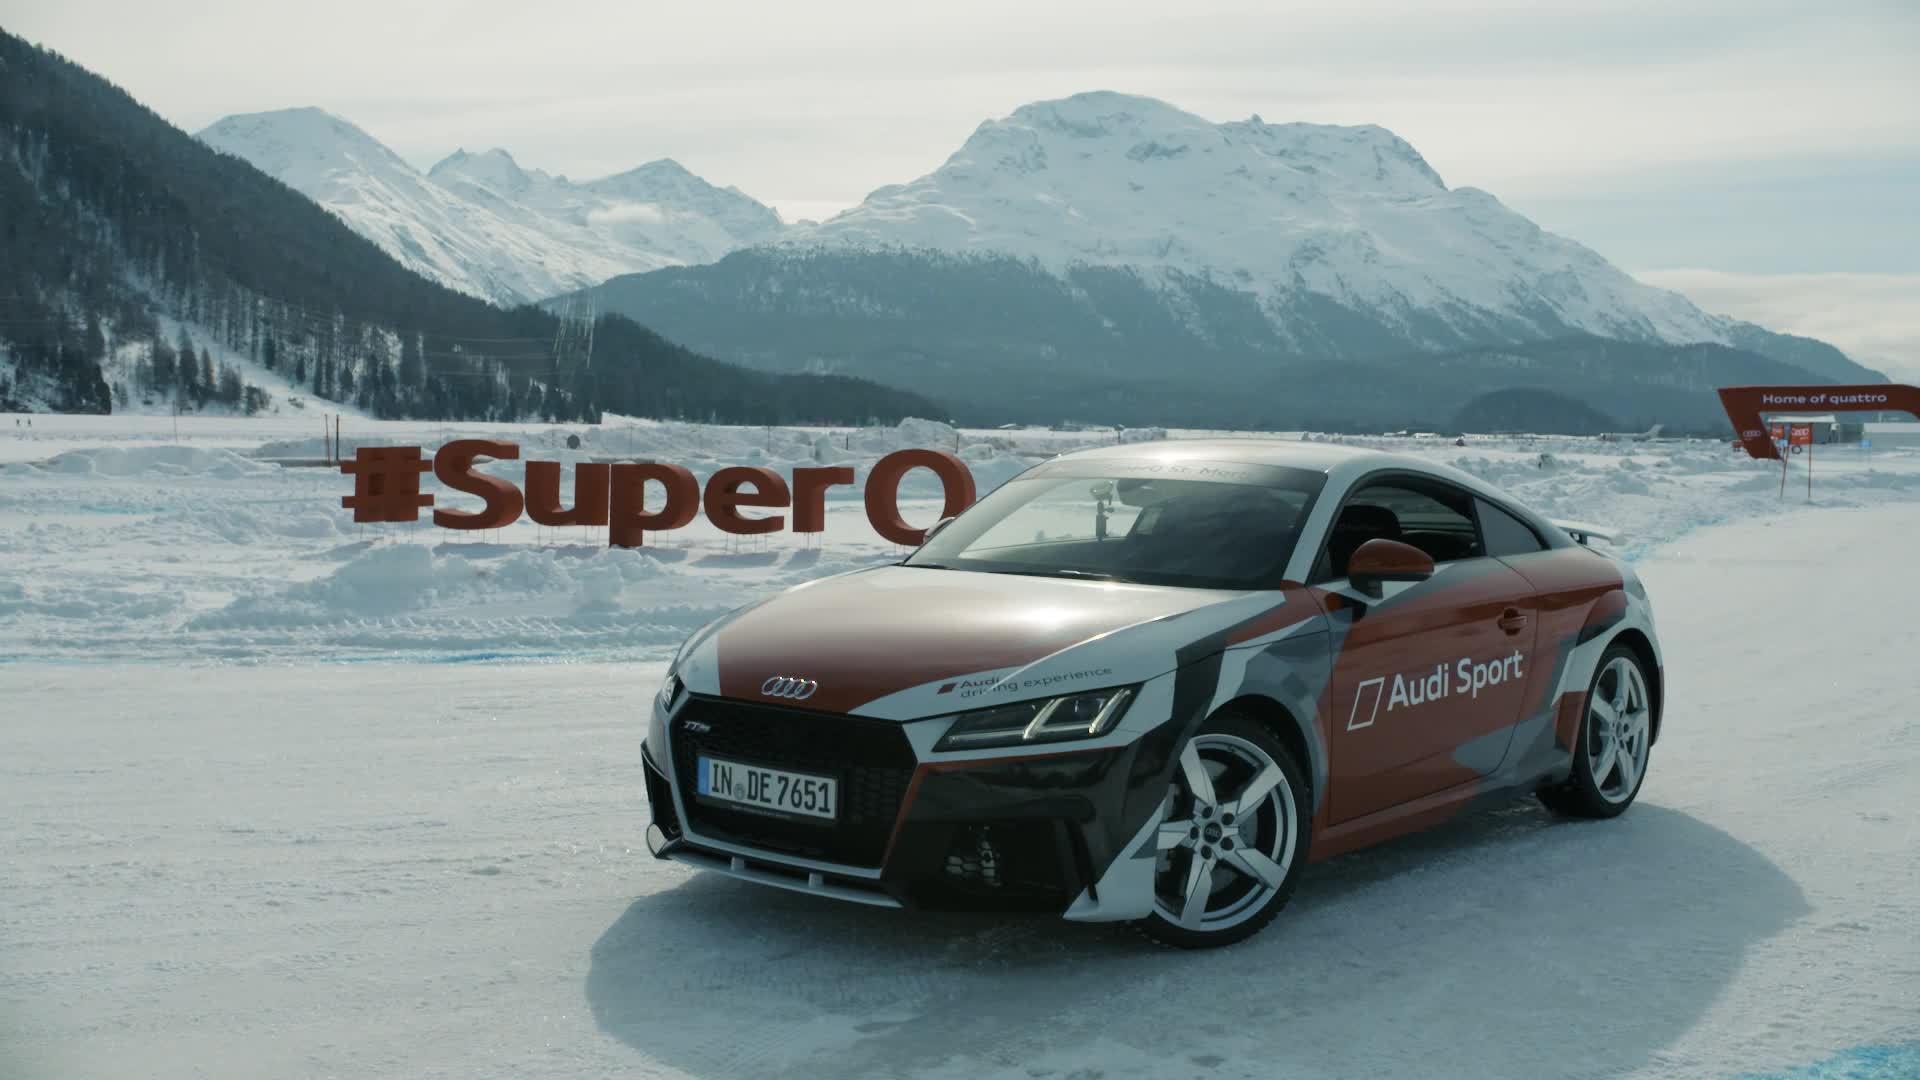 Ski World Cup St. Moritz: Audi #SuperQ Highlights